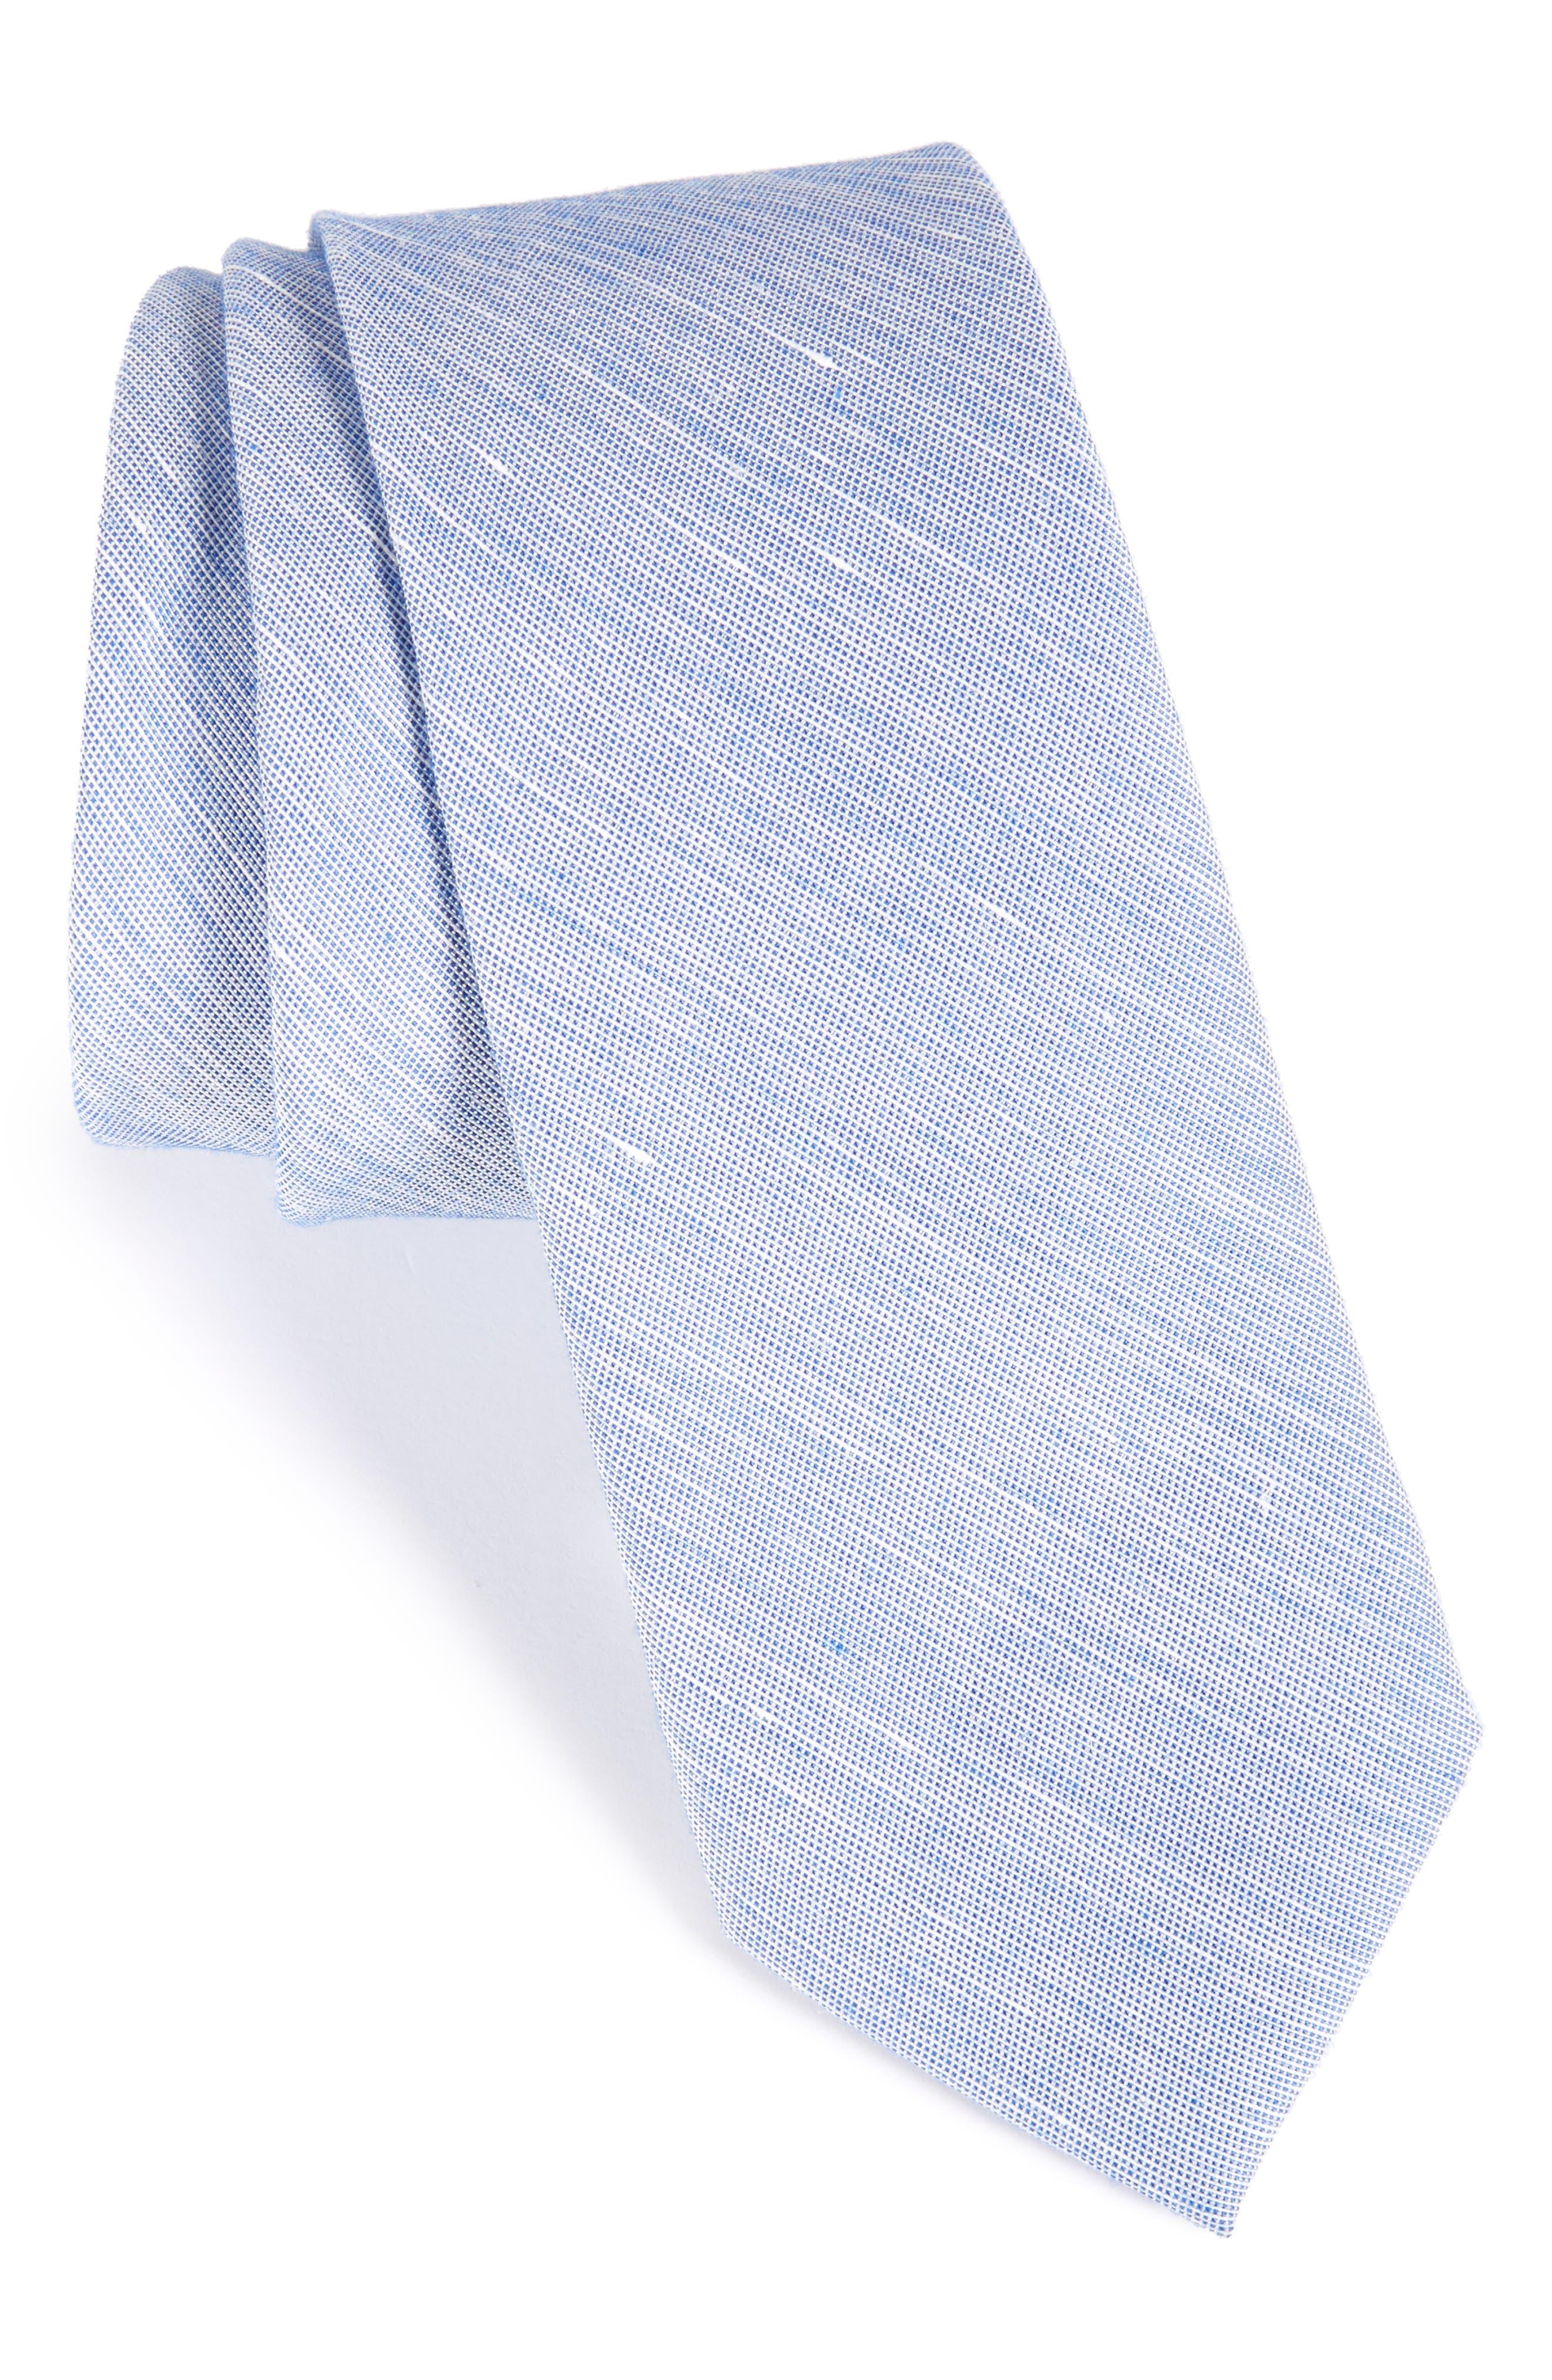 Main Image - Nordstrom Men's Shop Solid Silk Blend Skinny Tie